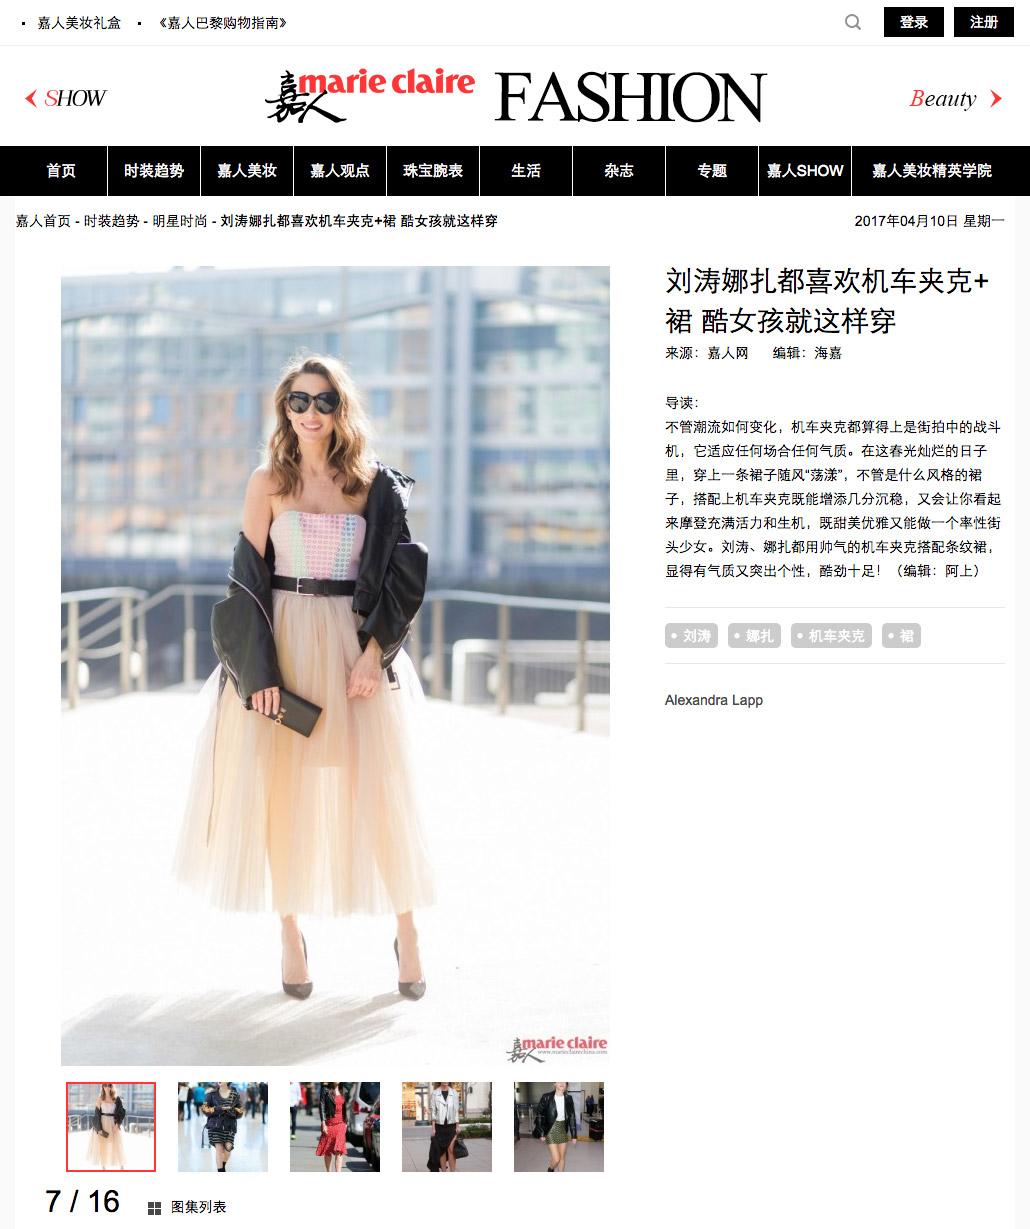 Mcchina - Marie Claire - 2017 04 - Alexandra Lapp - found on http://www.mcchina.com/fashion/celeb/20170410-pic-78263.shtml#pic=7